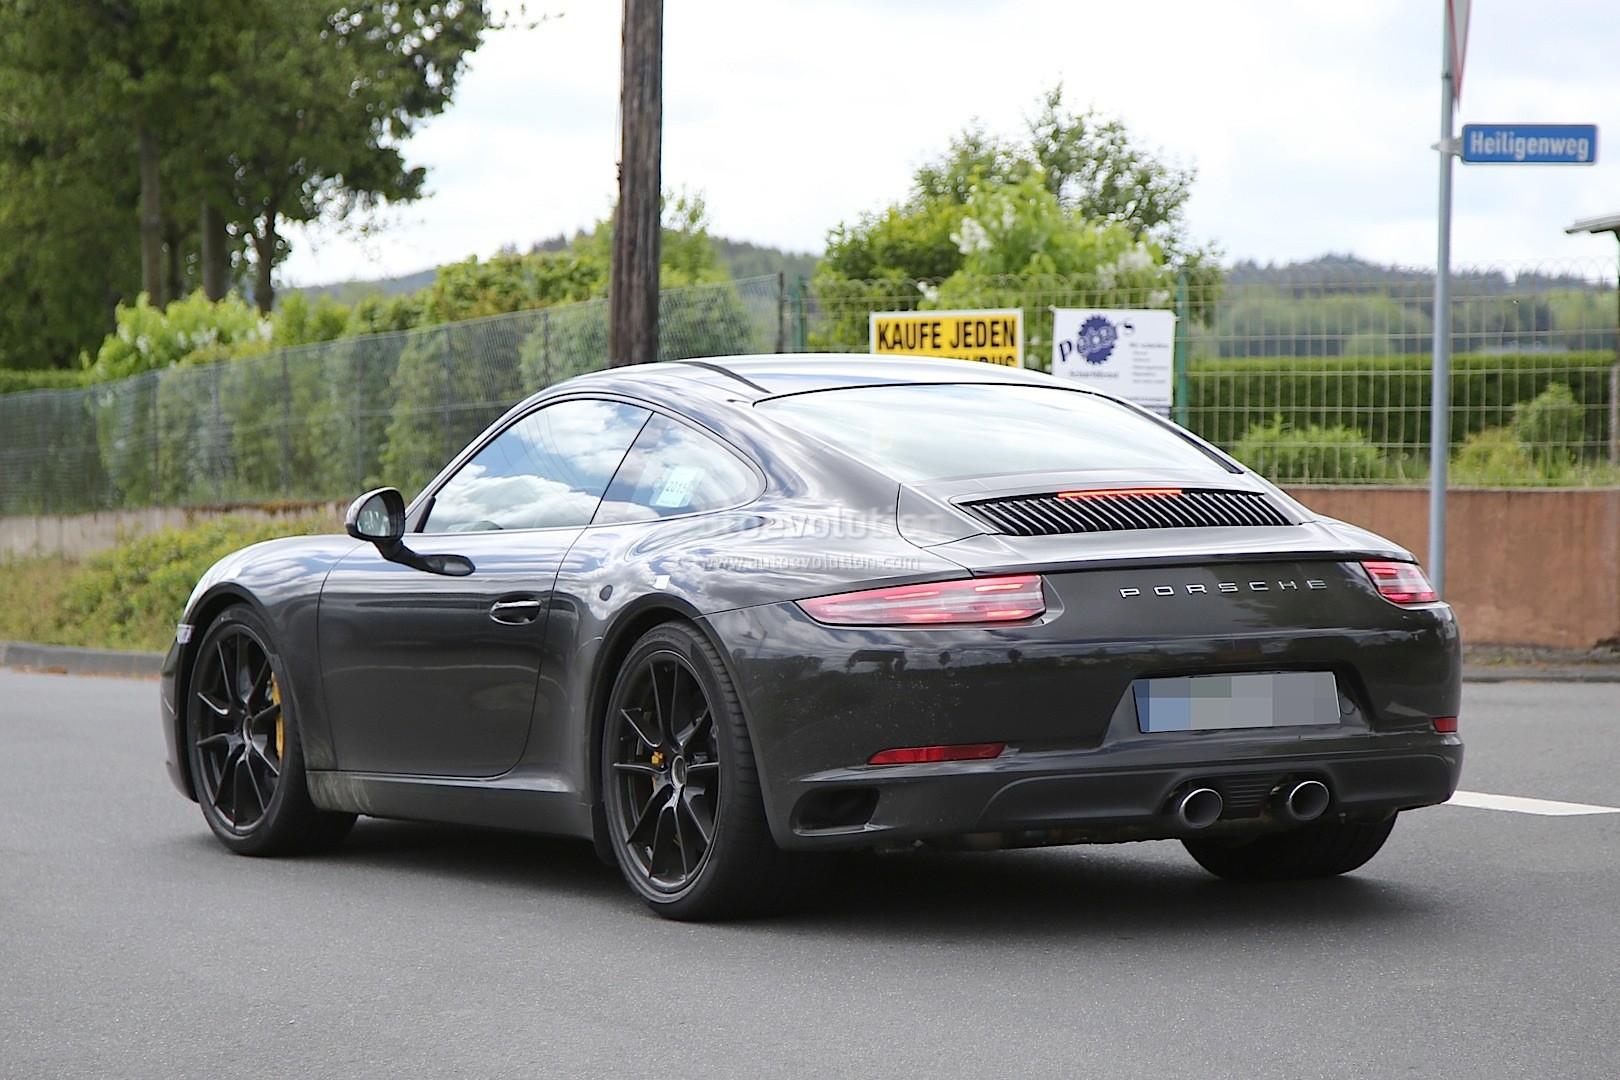 porsche 911 gt facelift latest retro spyshots revealed even looks handling confirmed basics pure autoevolution